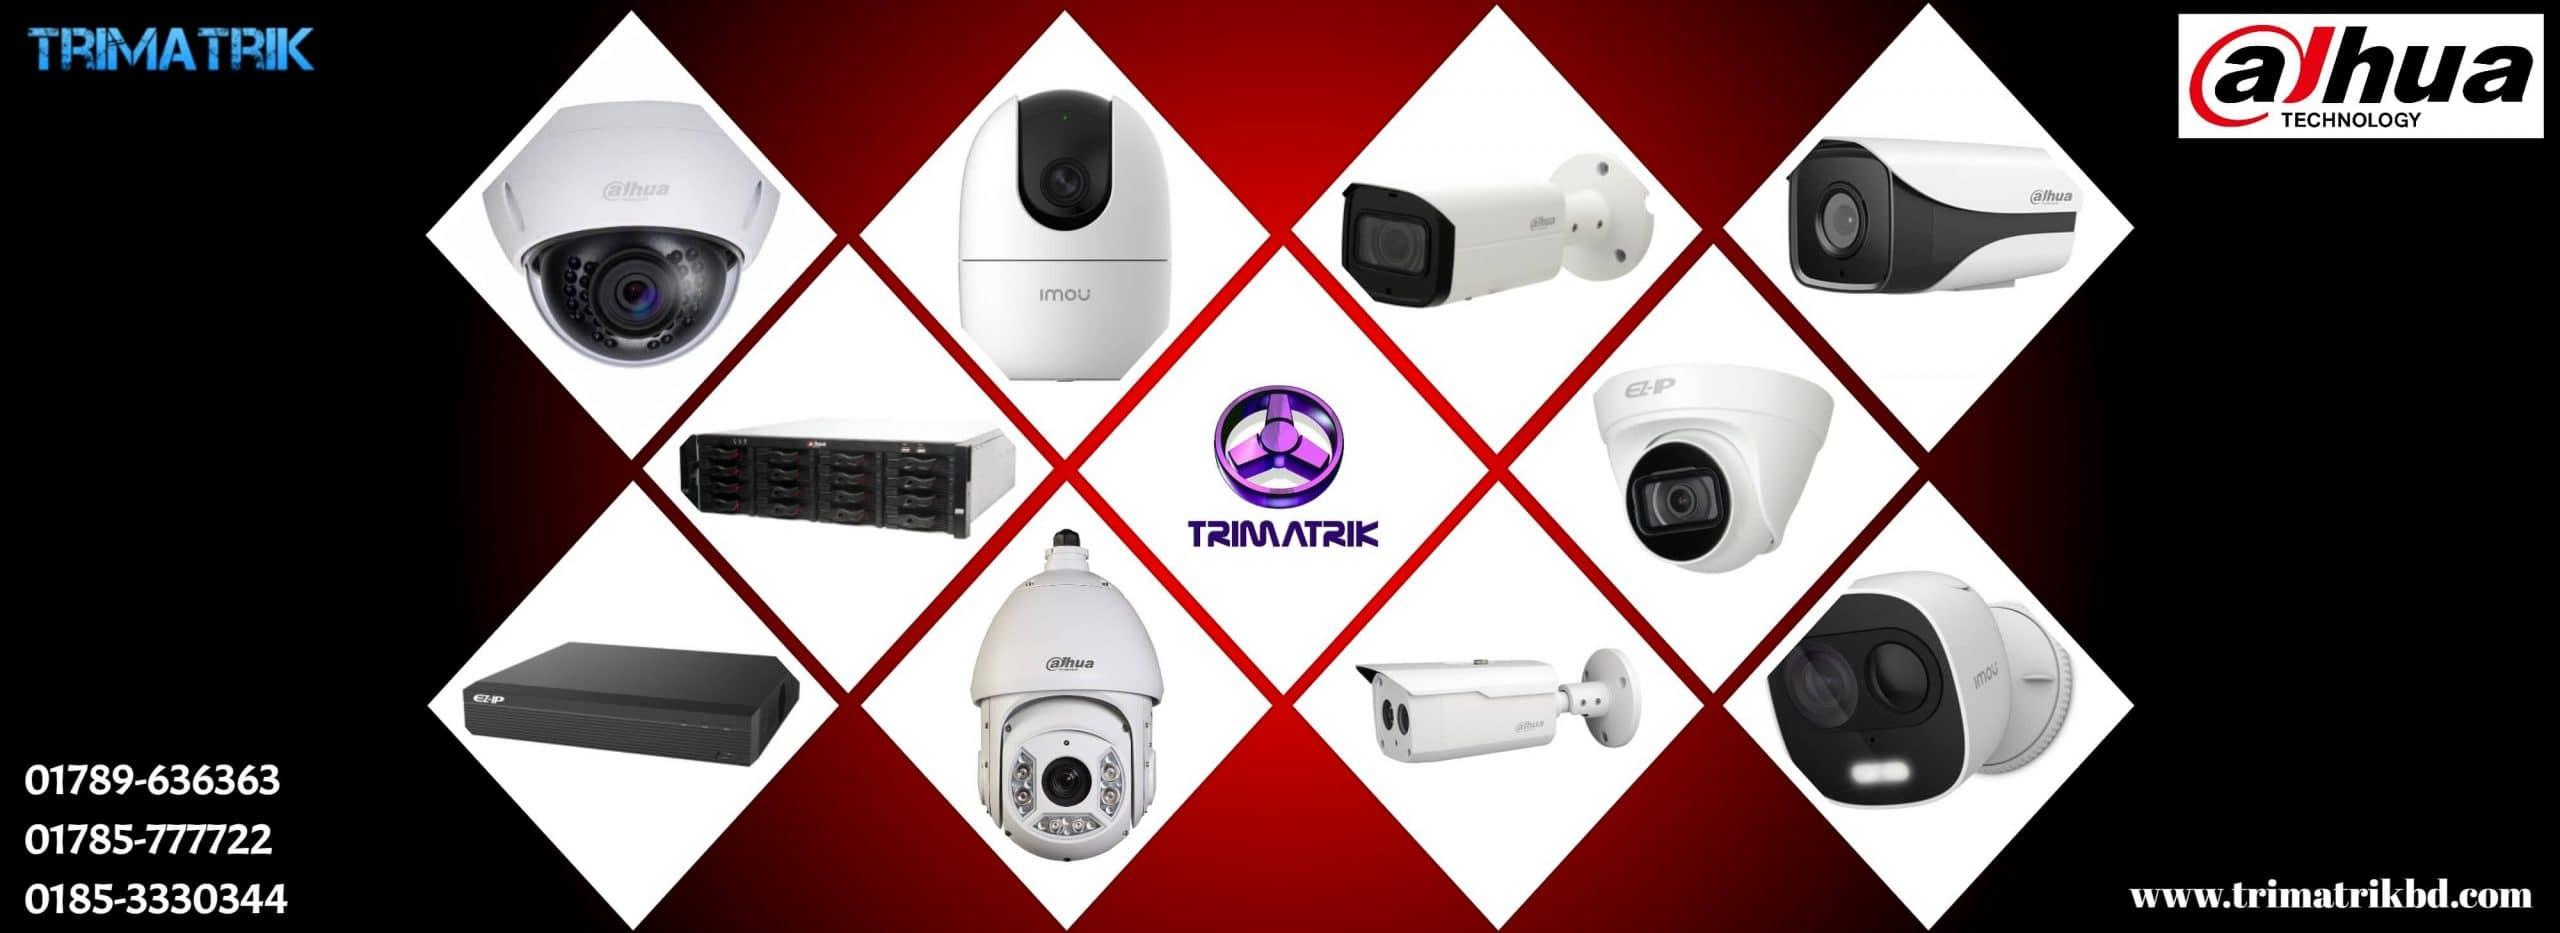 Dahua Ip camera price in BD